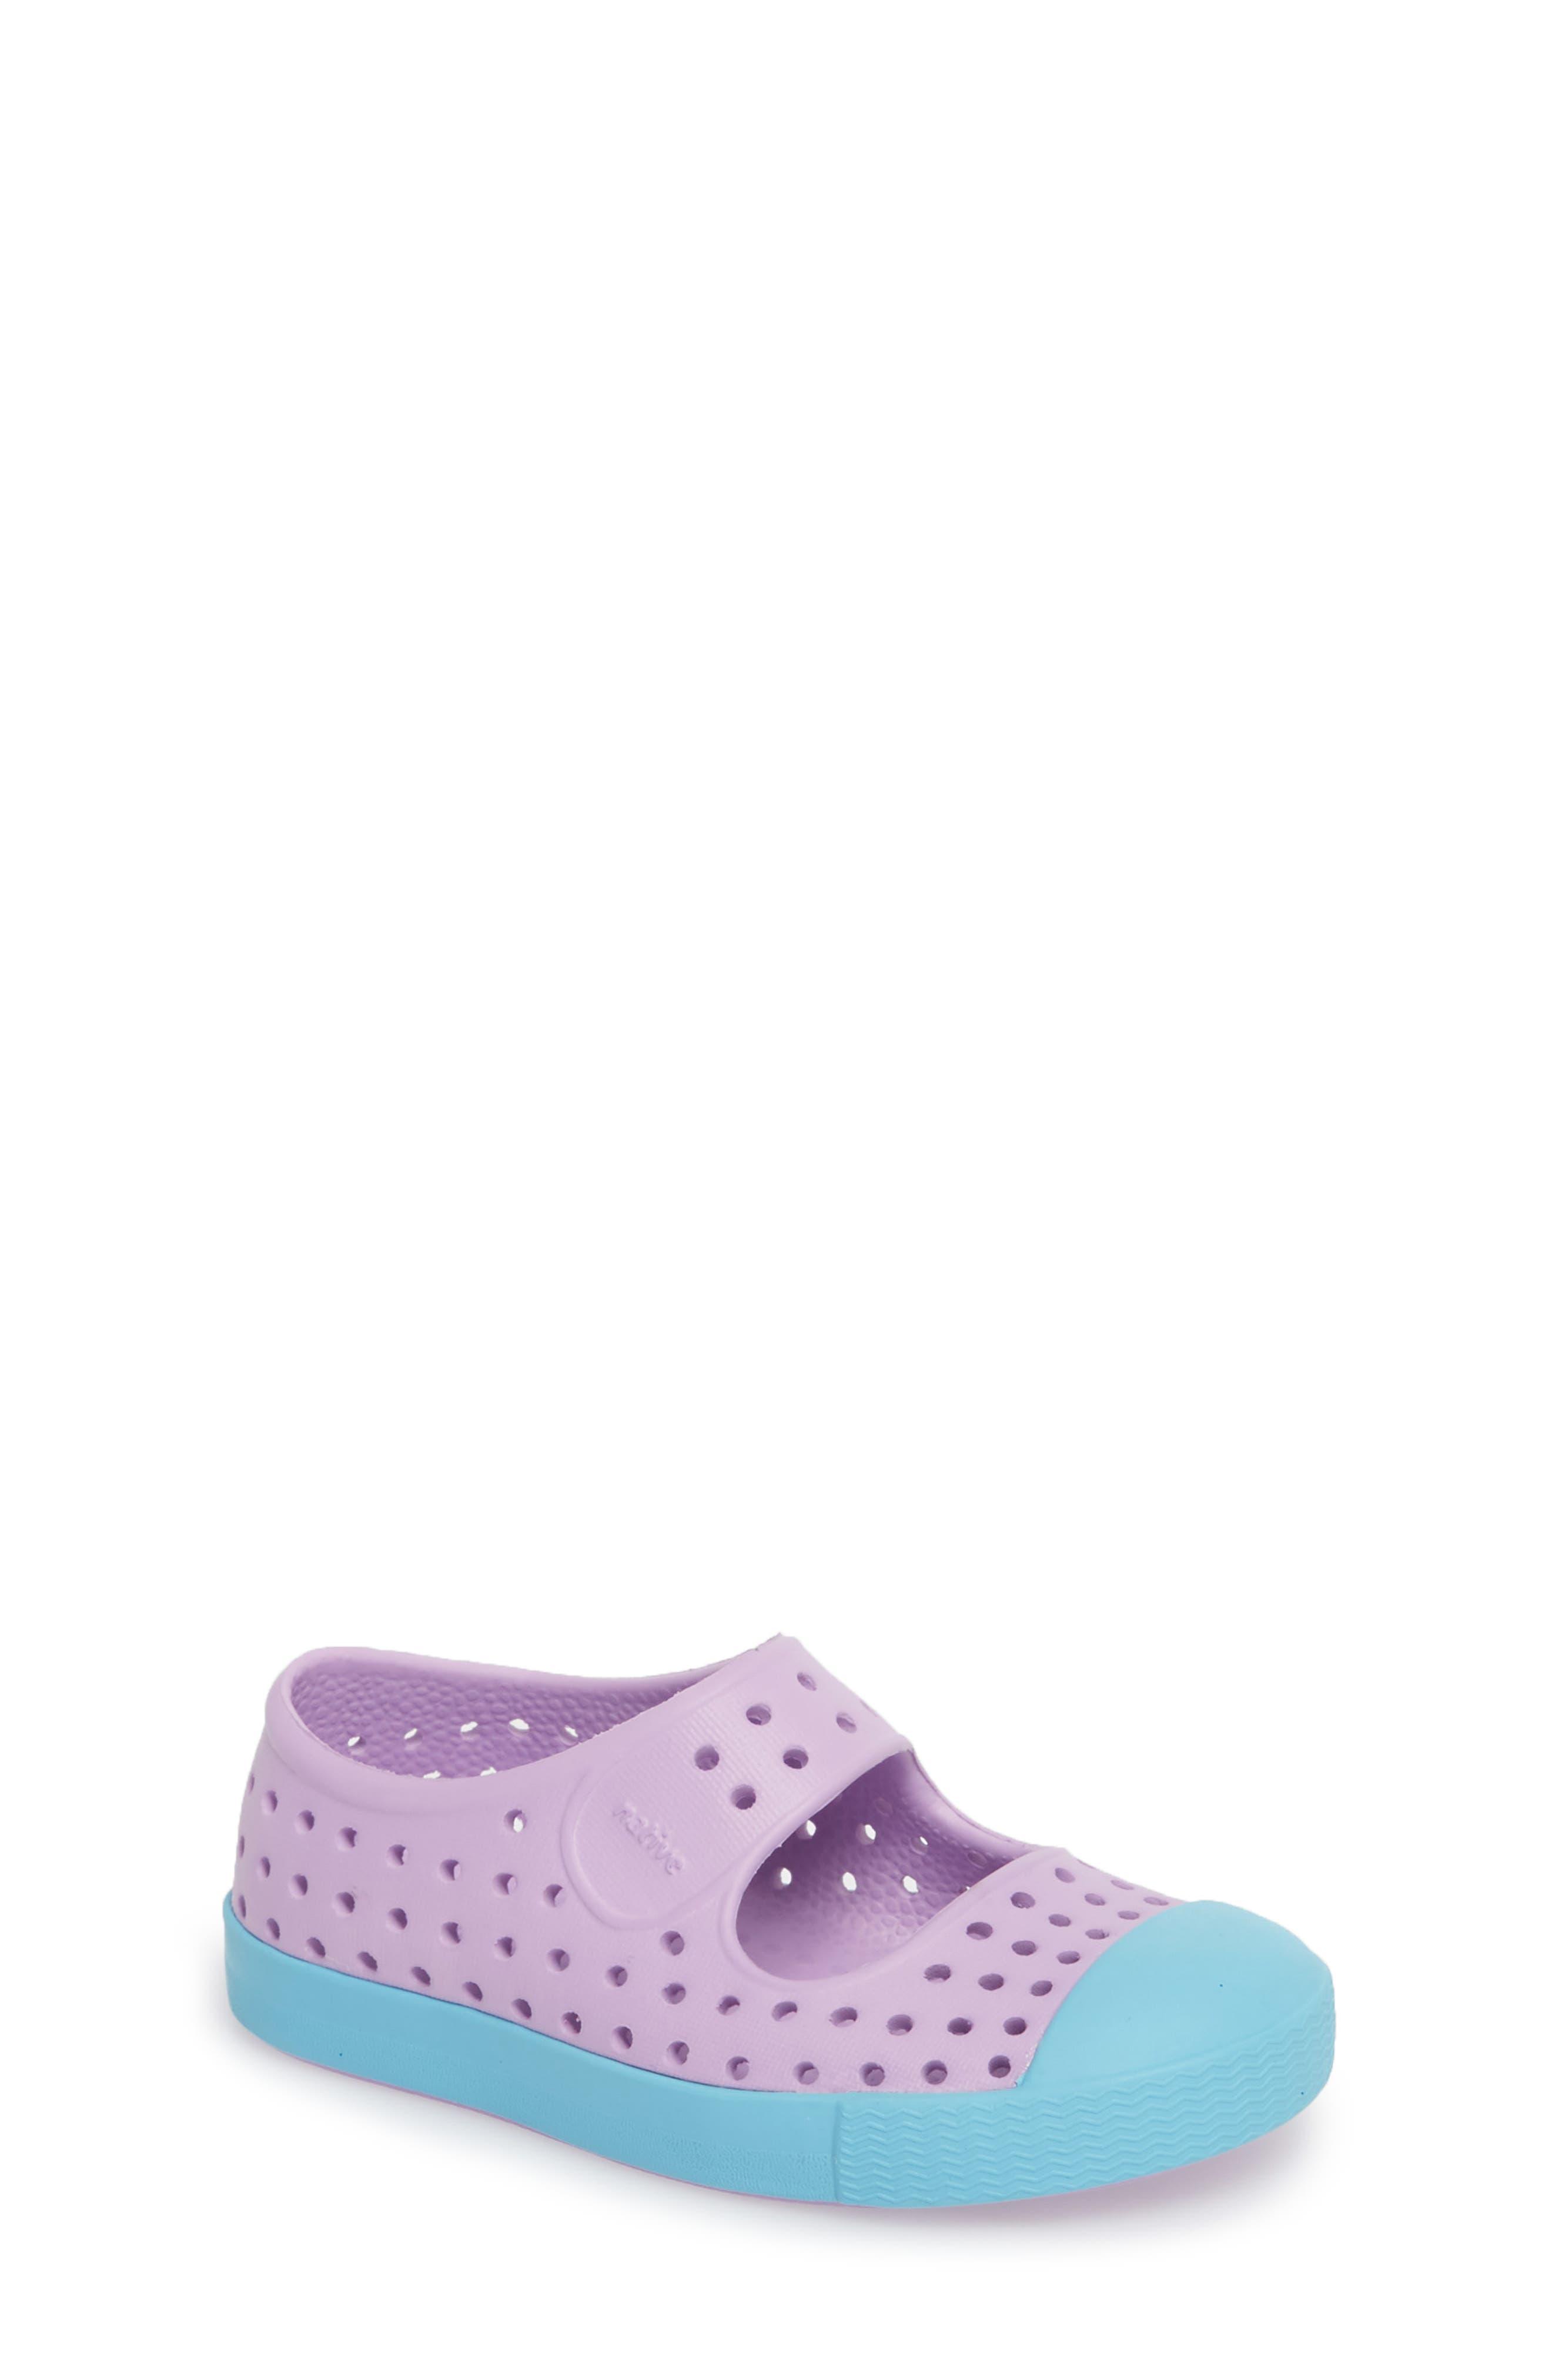 Native Shoes Juniper Mary Jane (Baby, Walker, Toddler & Little Kid)